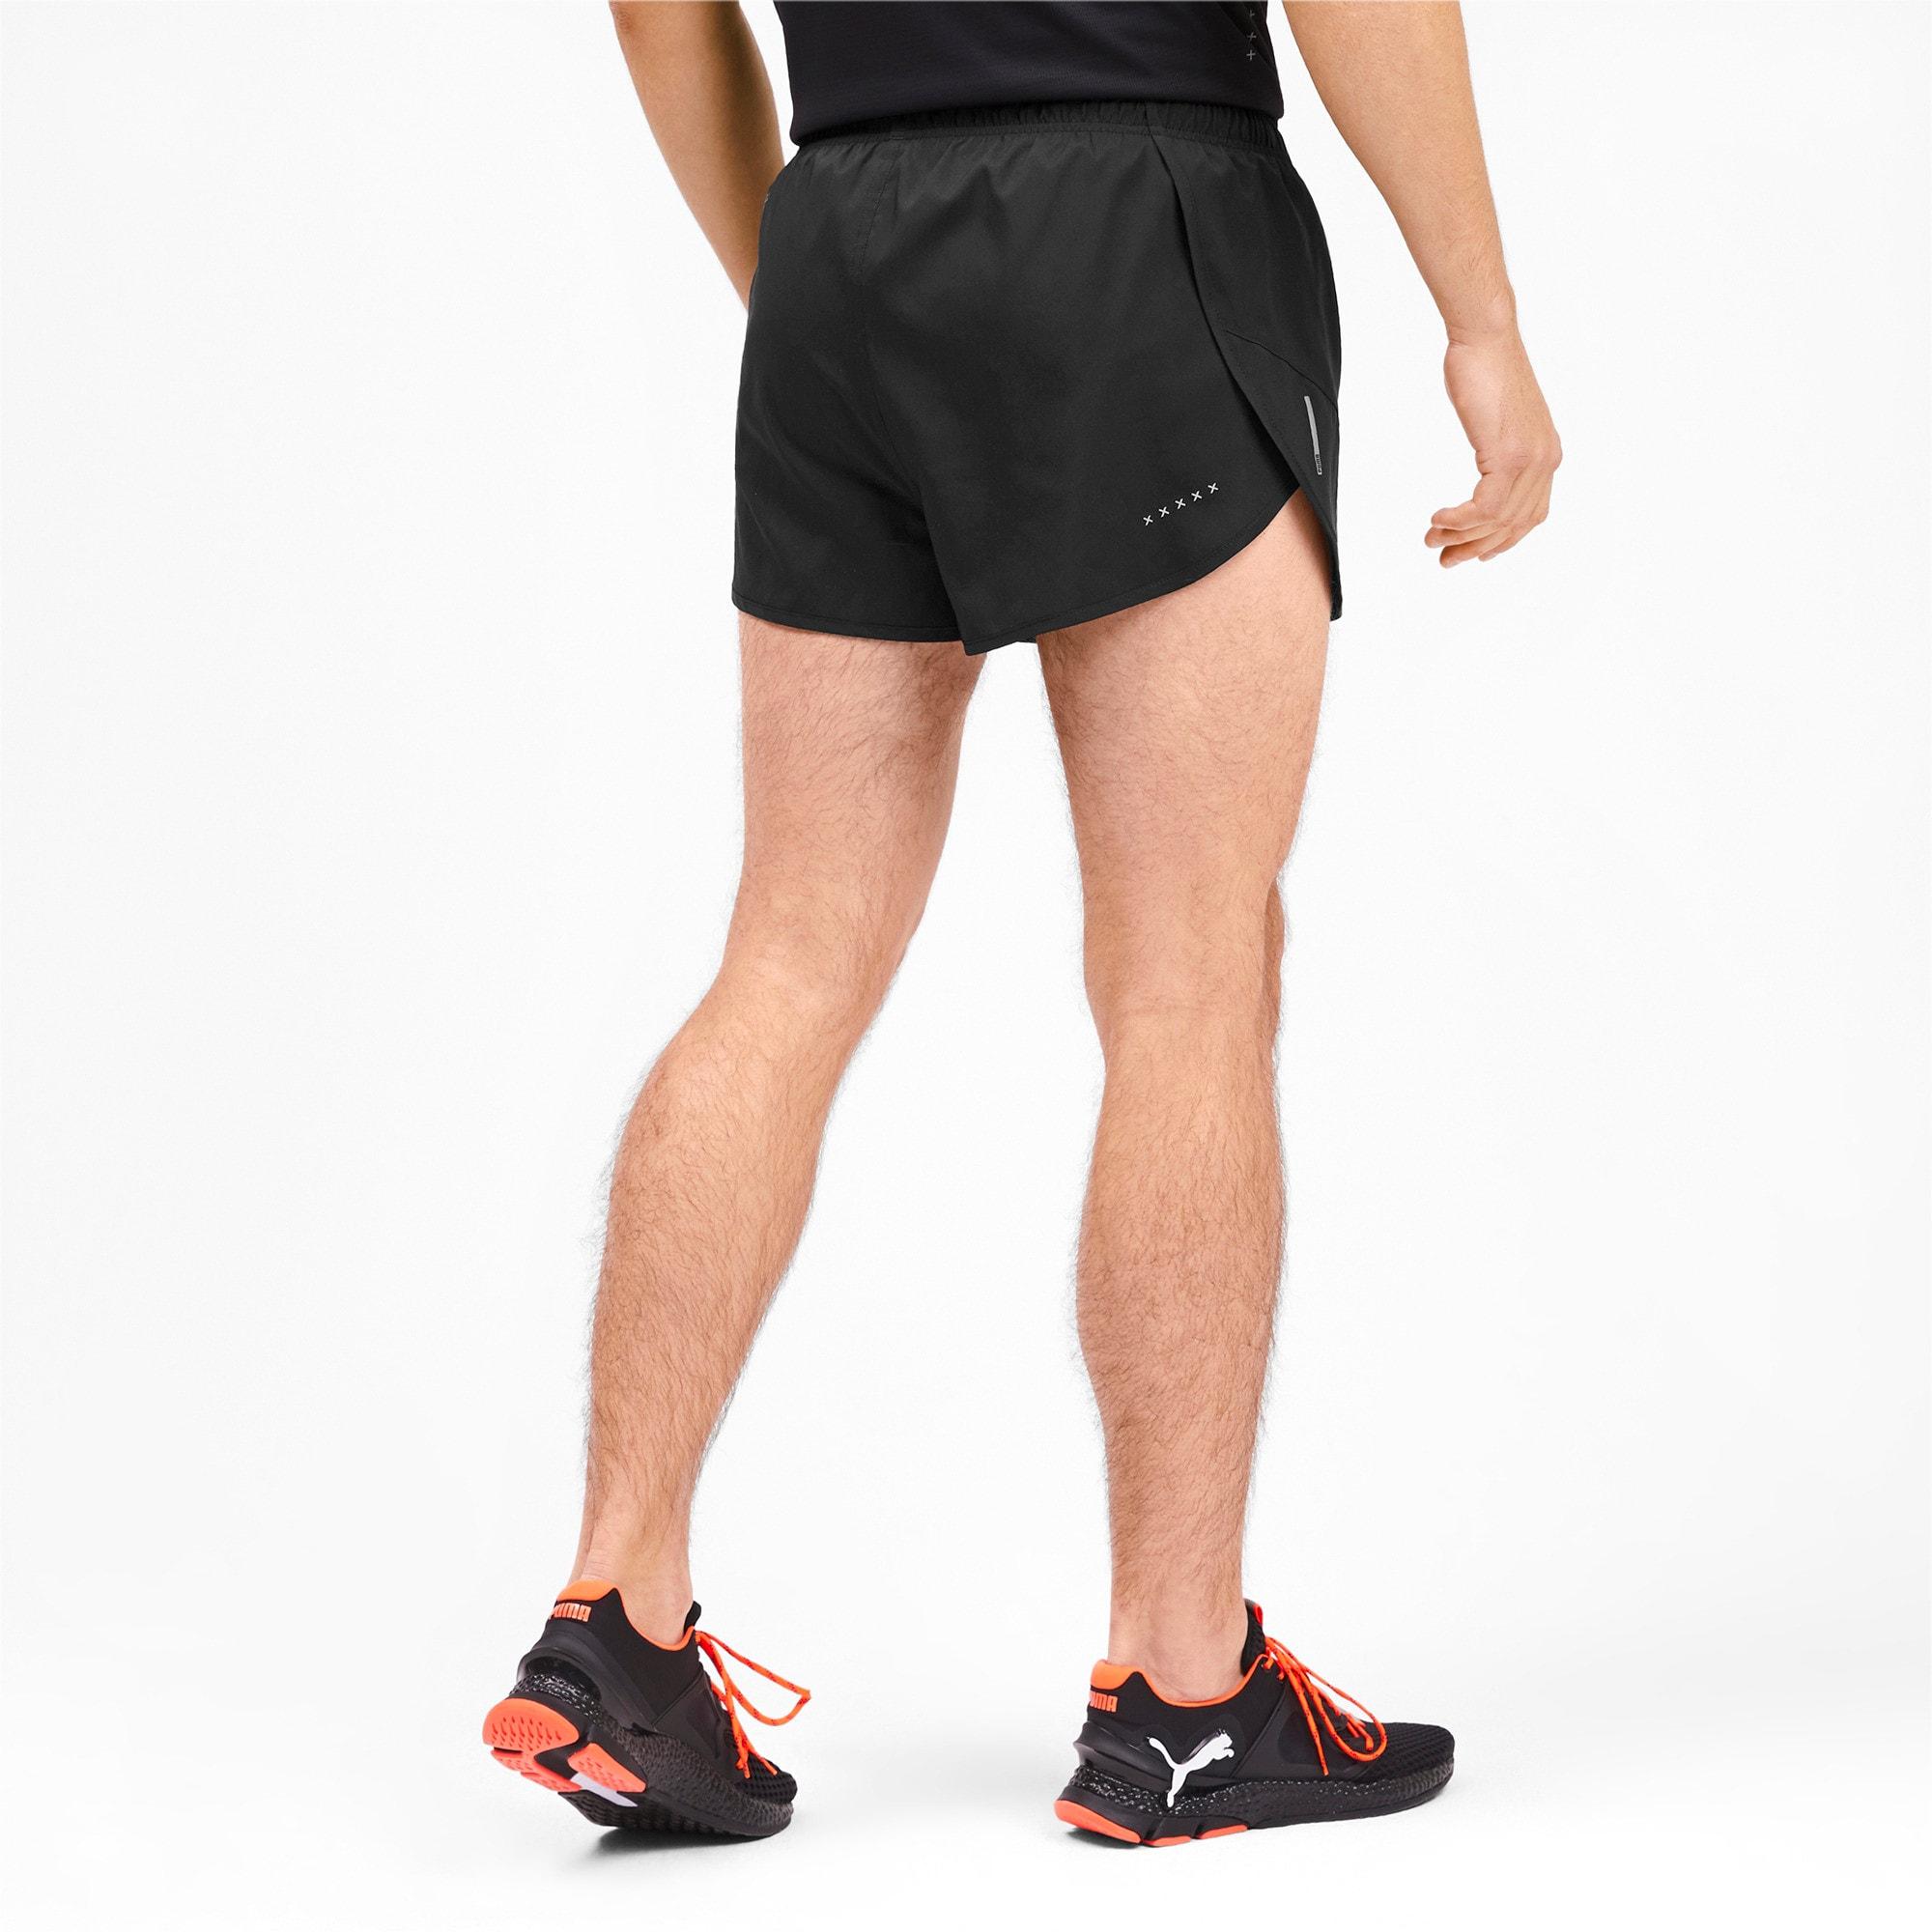 Thumbnail 2 of Ignite Men's Split Shorts, Puma Black, medium